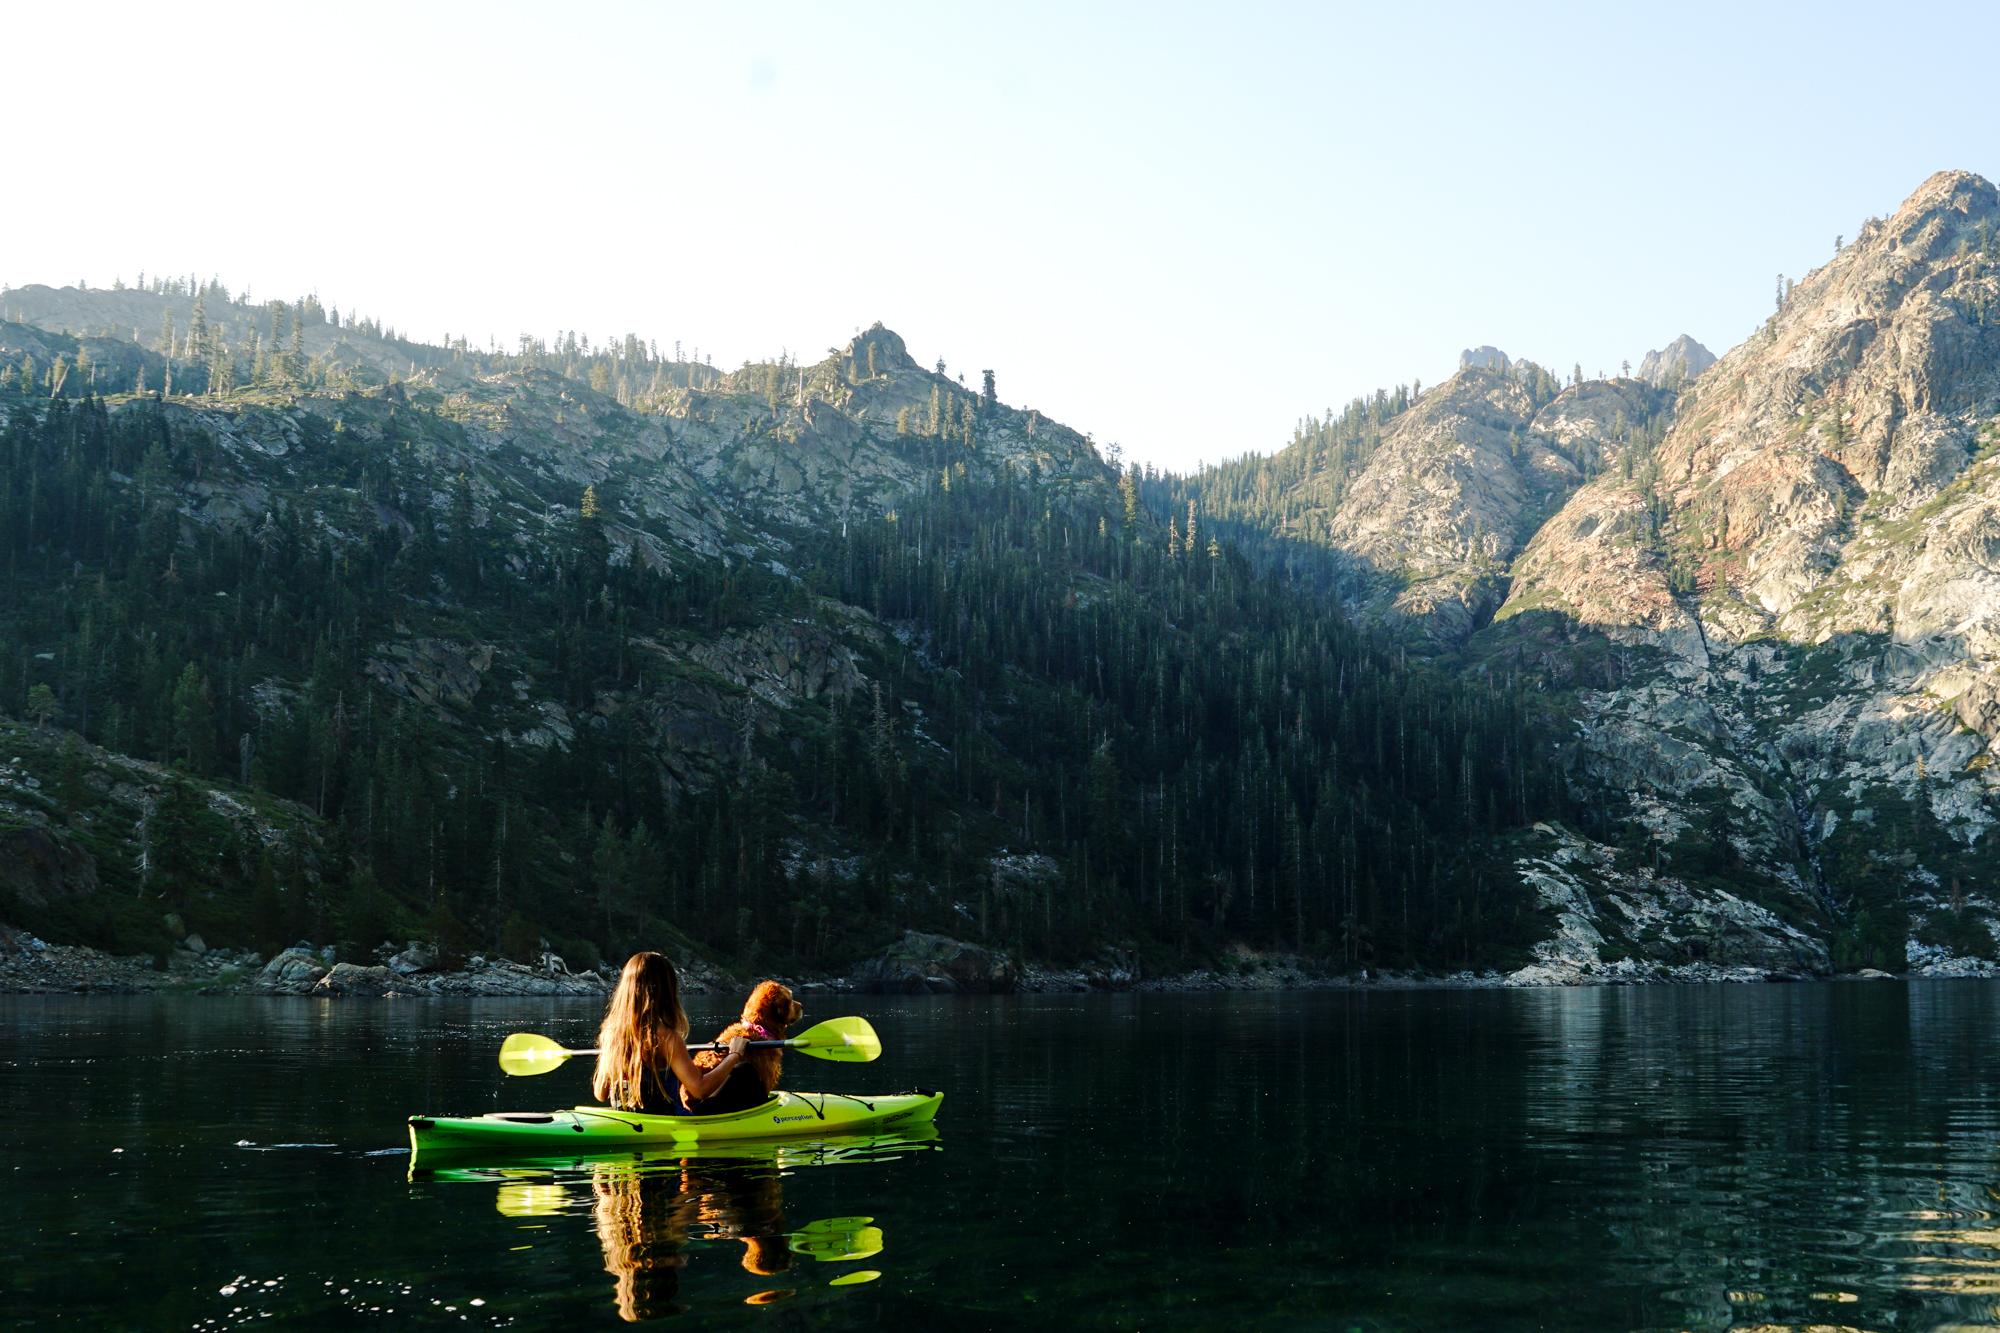 Summer-LakeTahoe-16.jpg